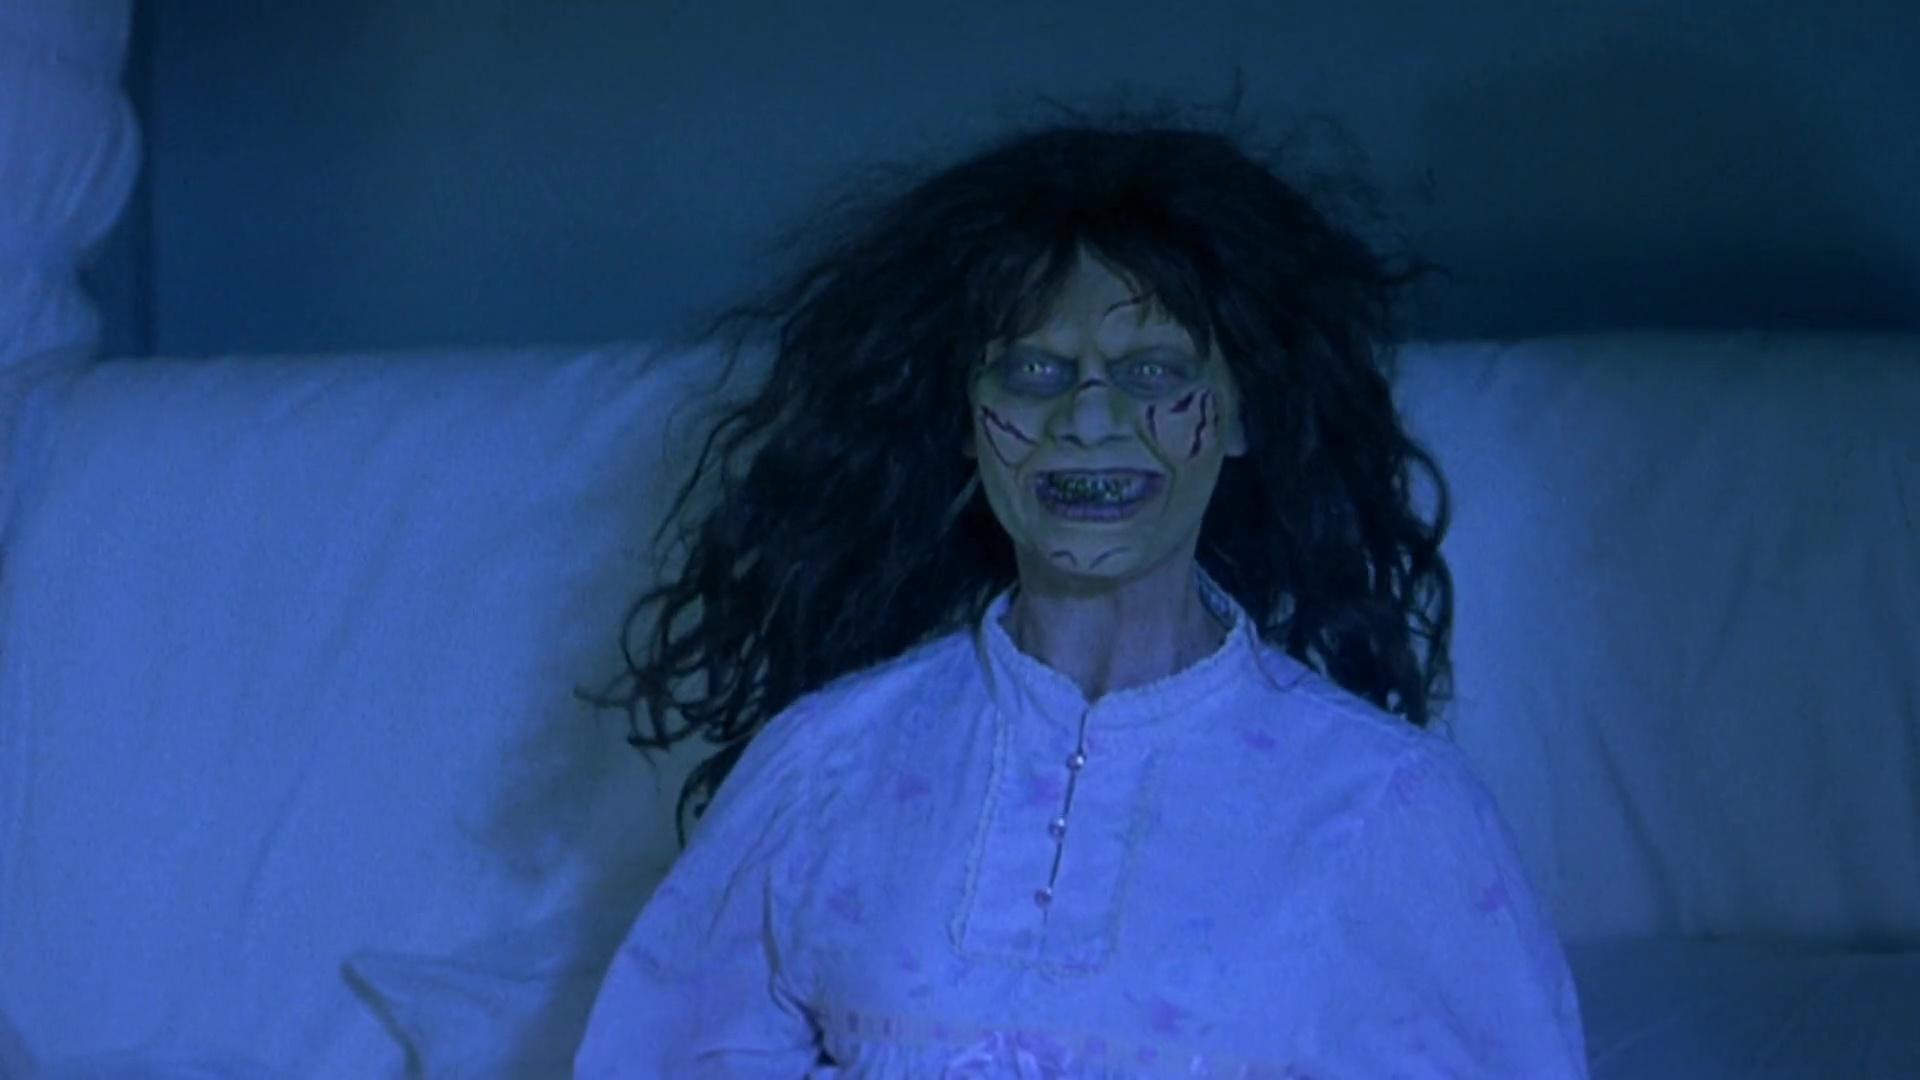 Image scary movie 2 disney dimension